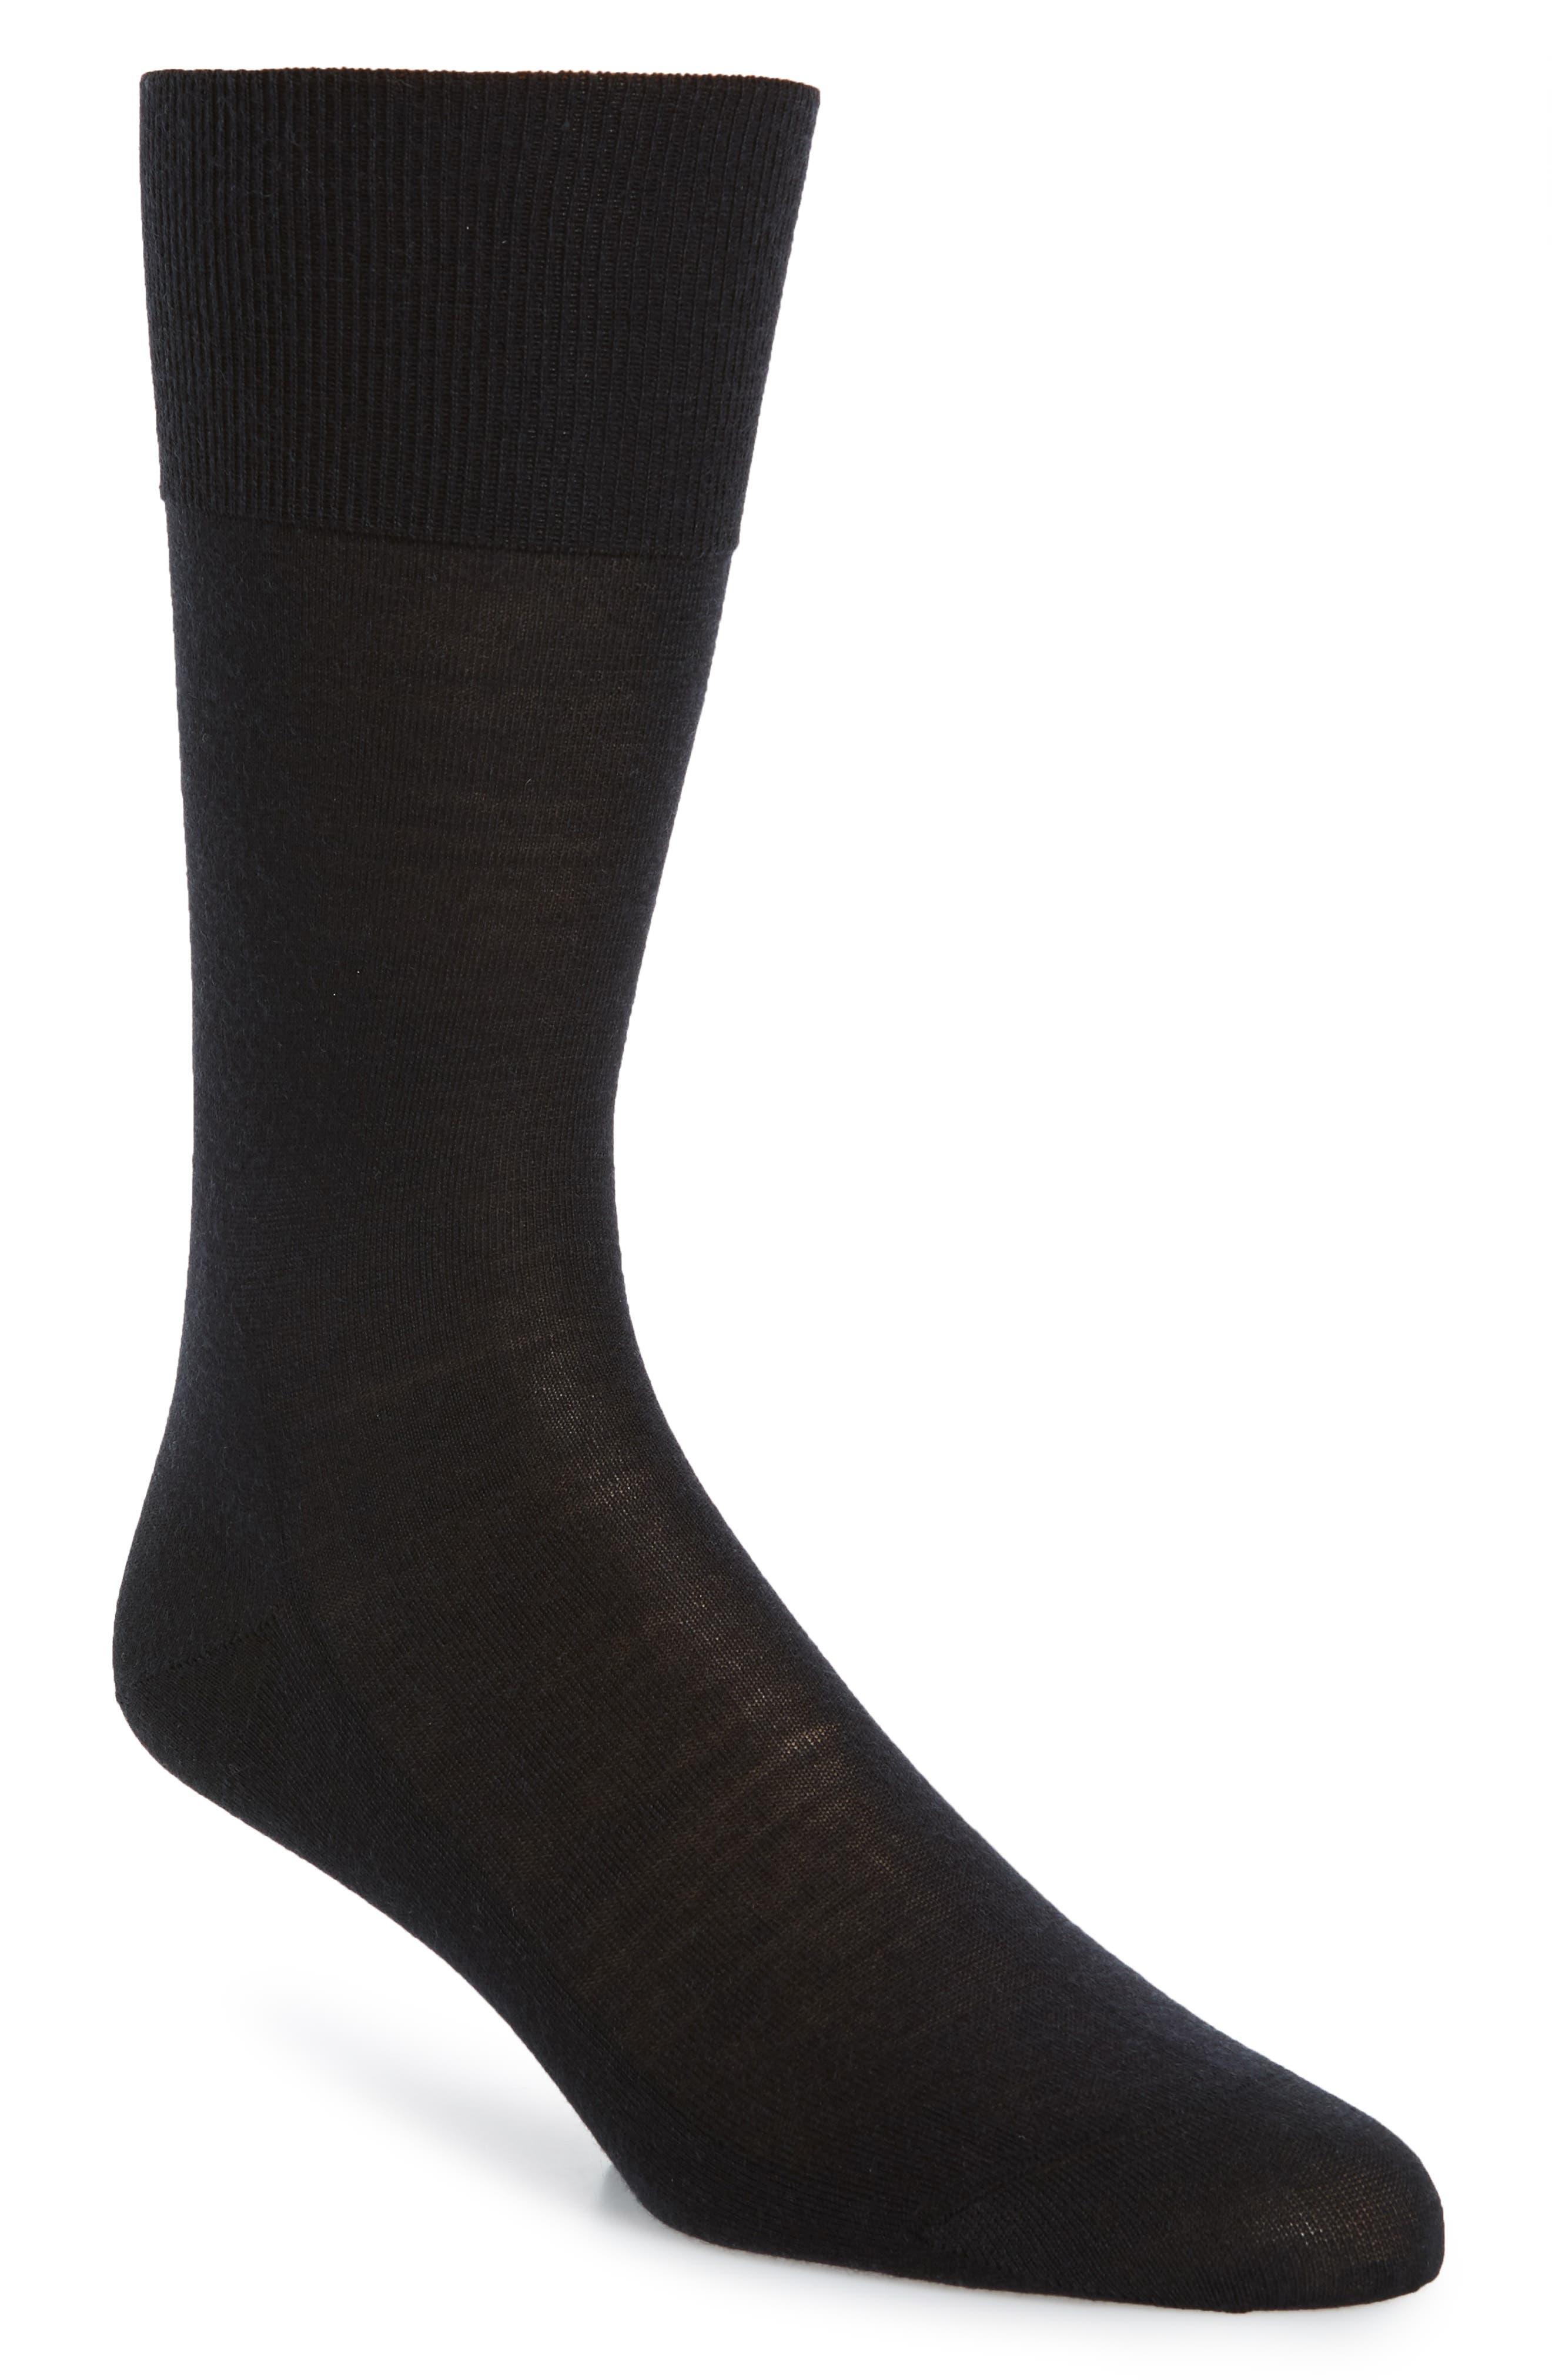 FALKE No. 6 Merino Wool Blend Socks, Main, color, BLACK